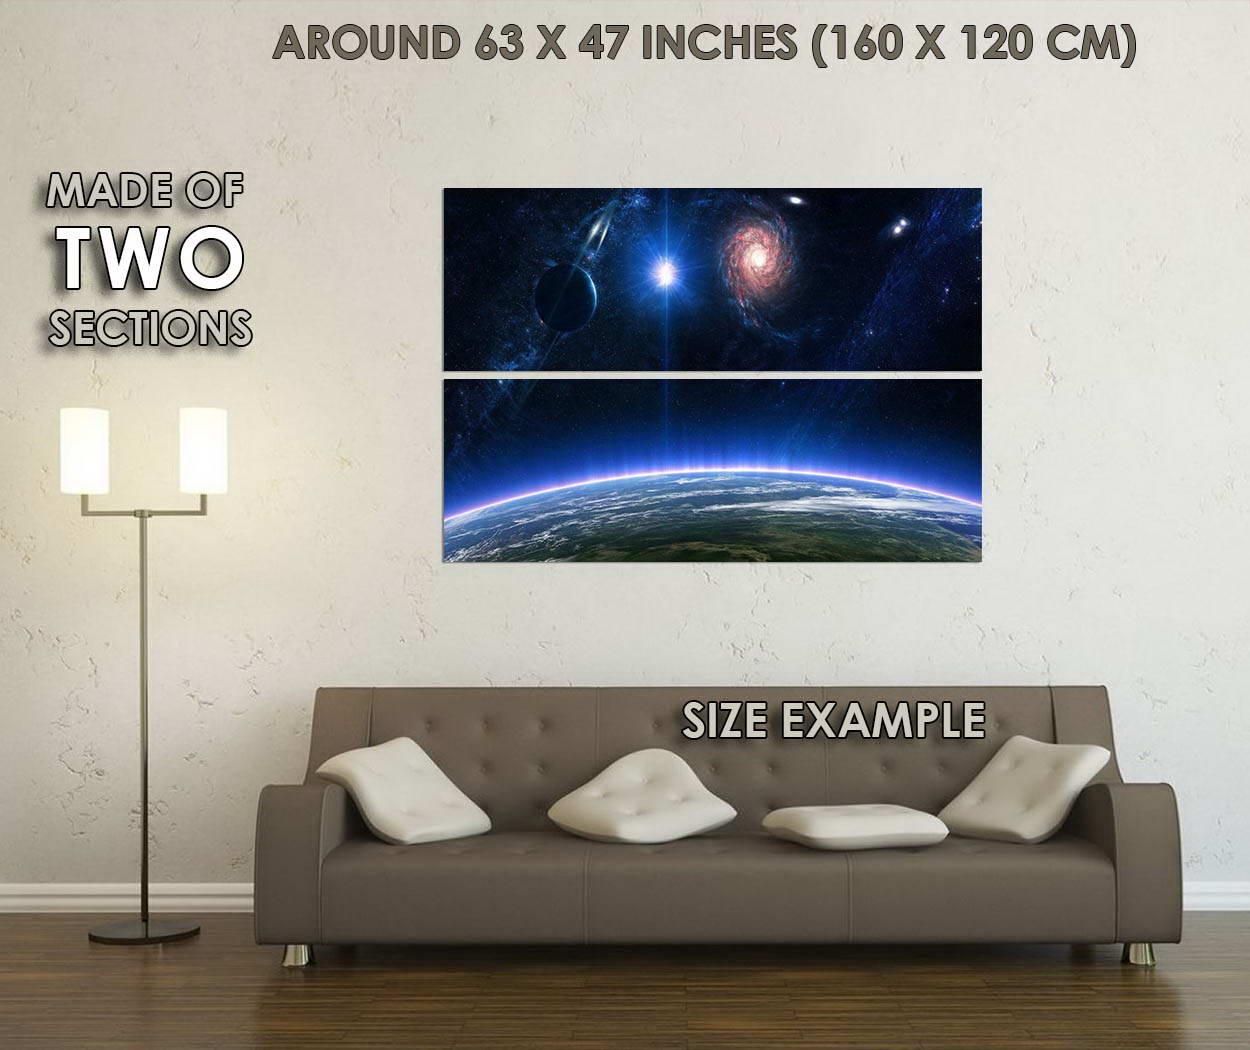 10337-Universe-Space-Galaxy-Stars-Nebula-Landscape-LAMINATED-POSTER-CA thumbnail 6